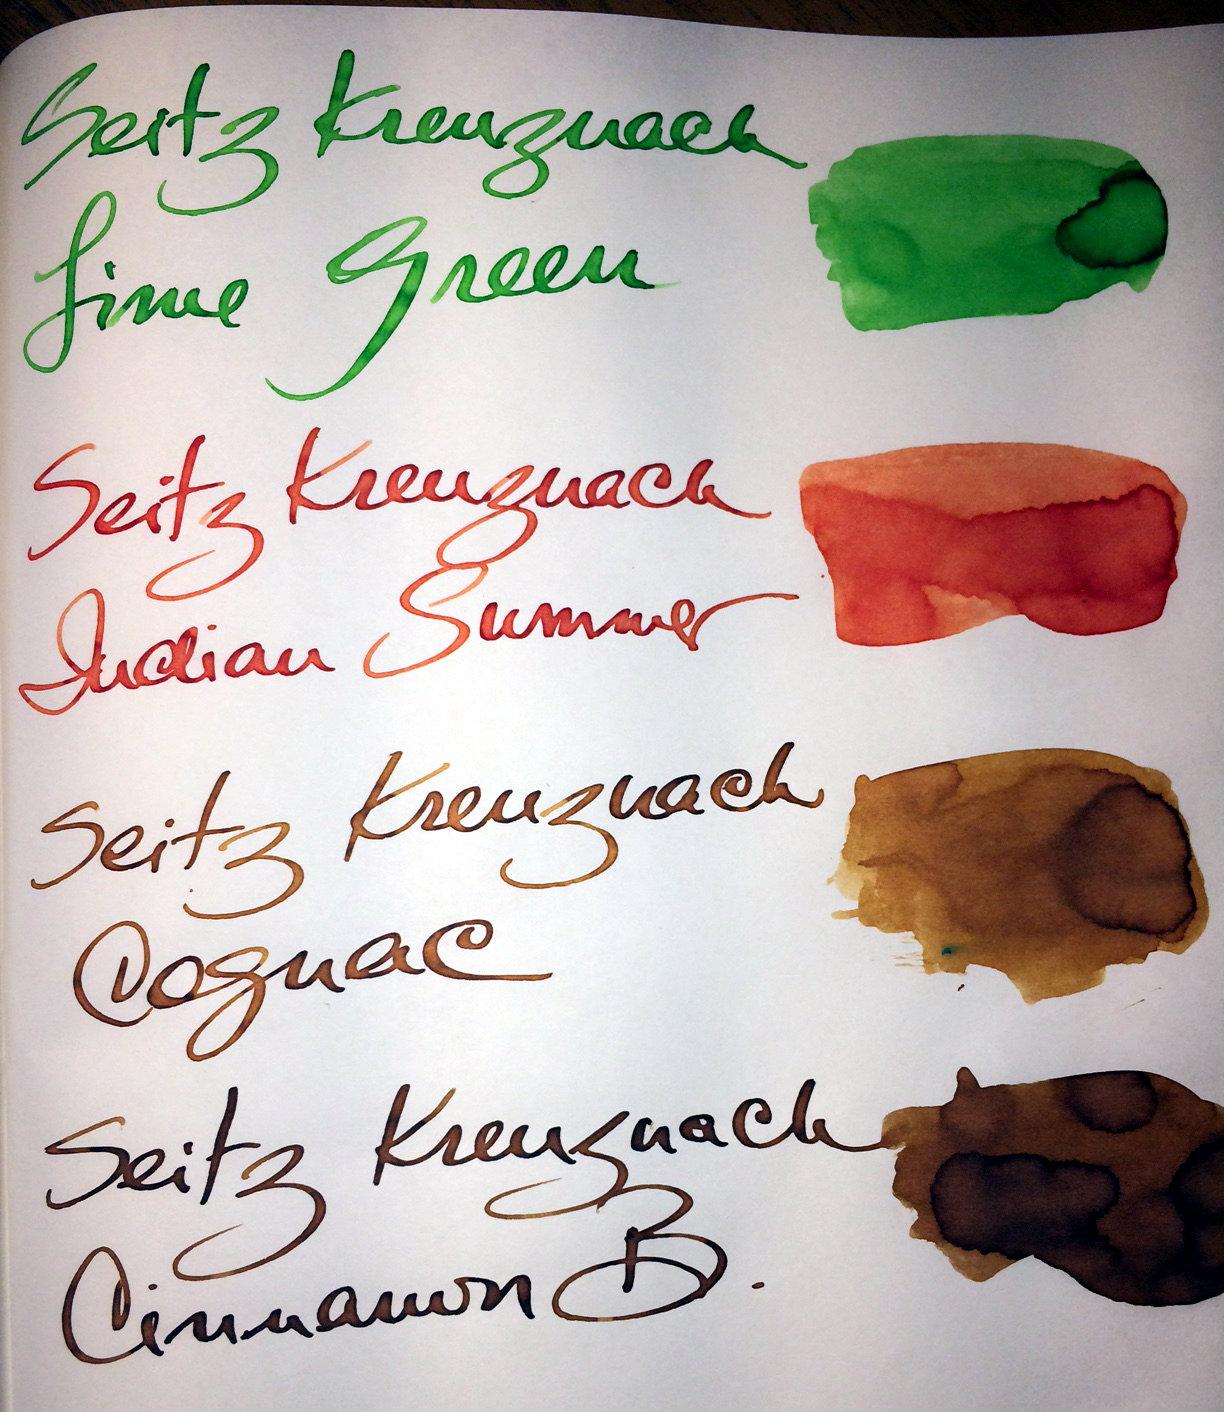 fpn_1465717379__seitzkreuznach04.jpg